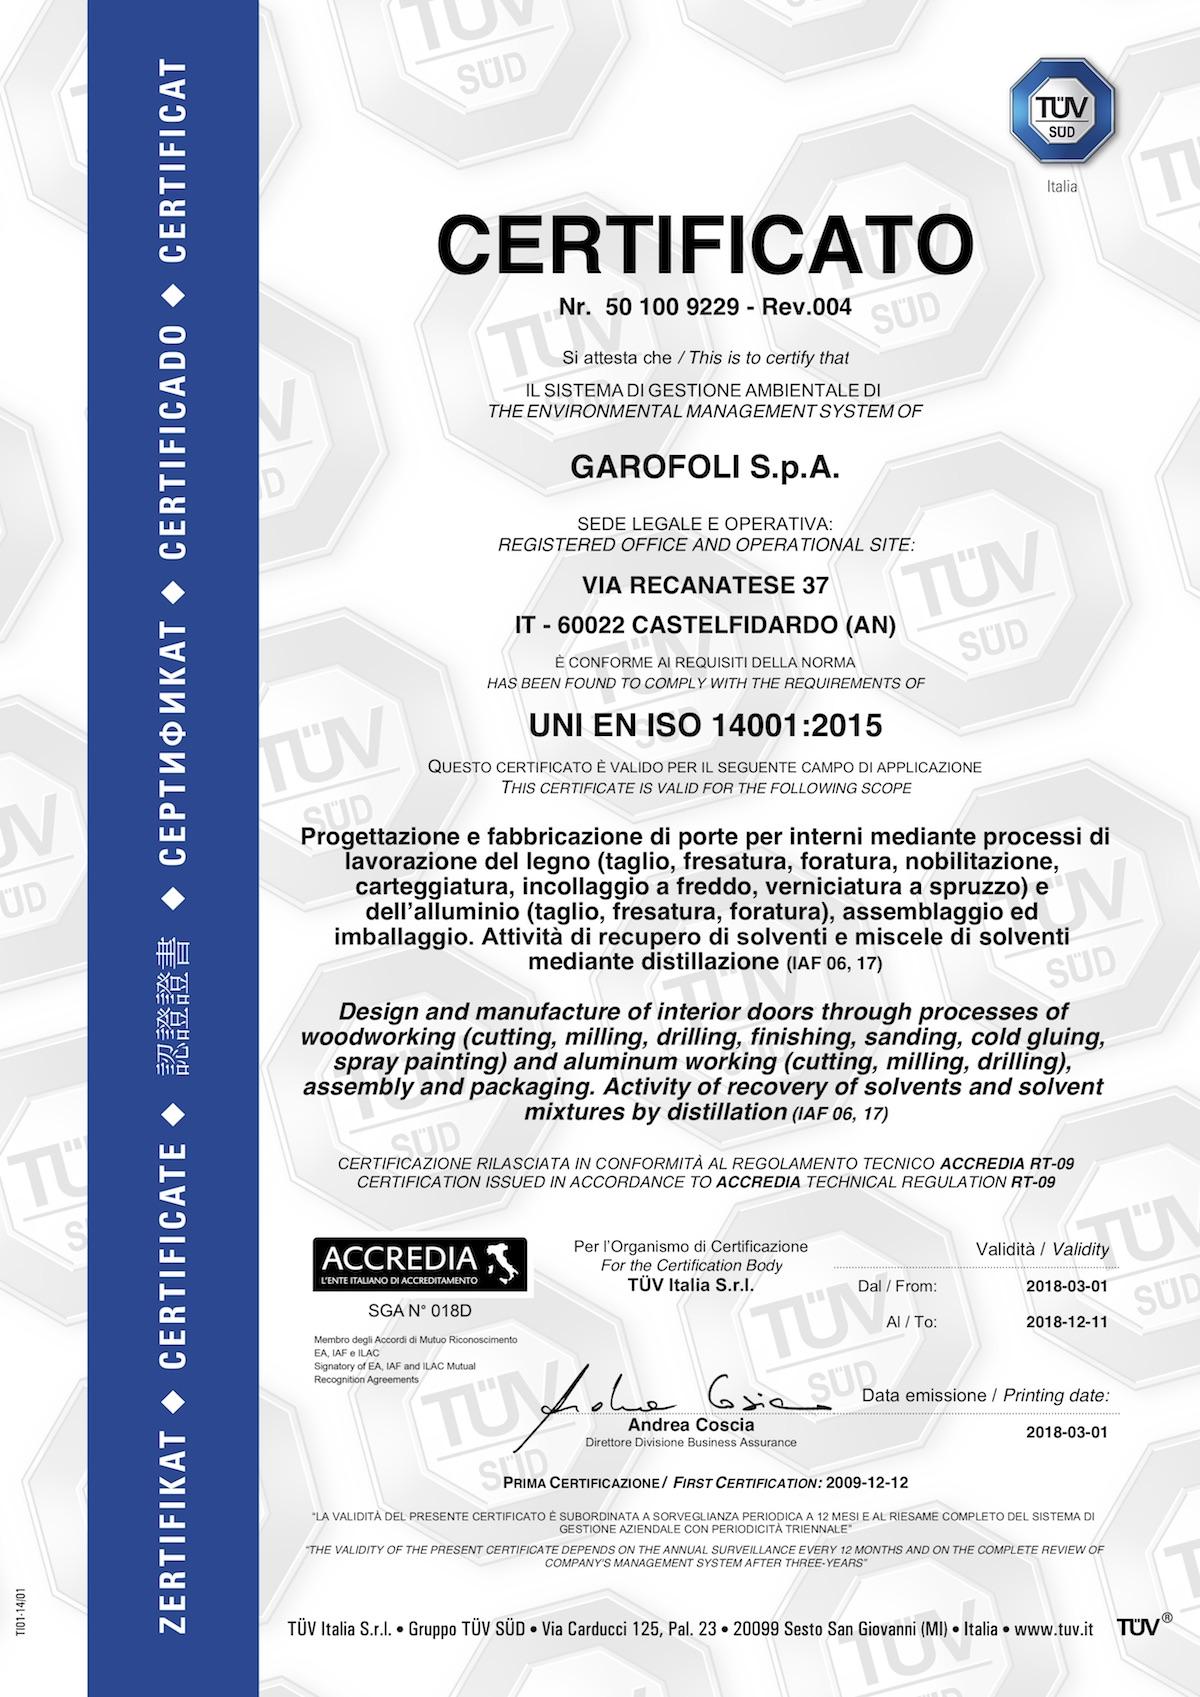 Garofoli certificato UNI EN ISO - Garofoli